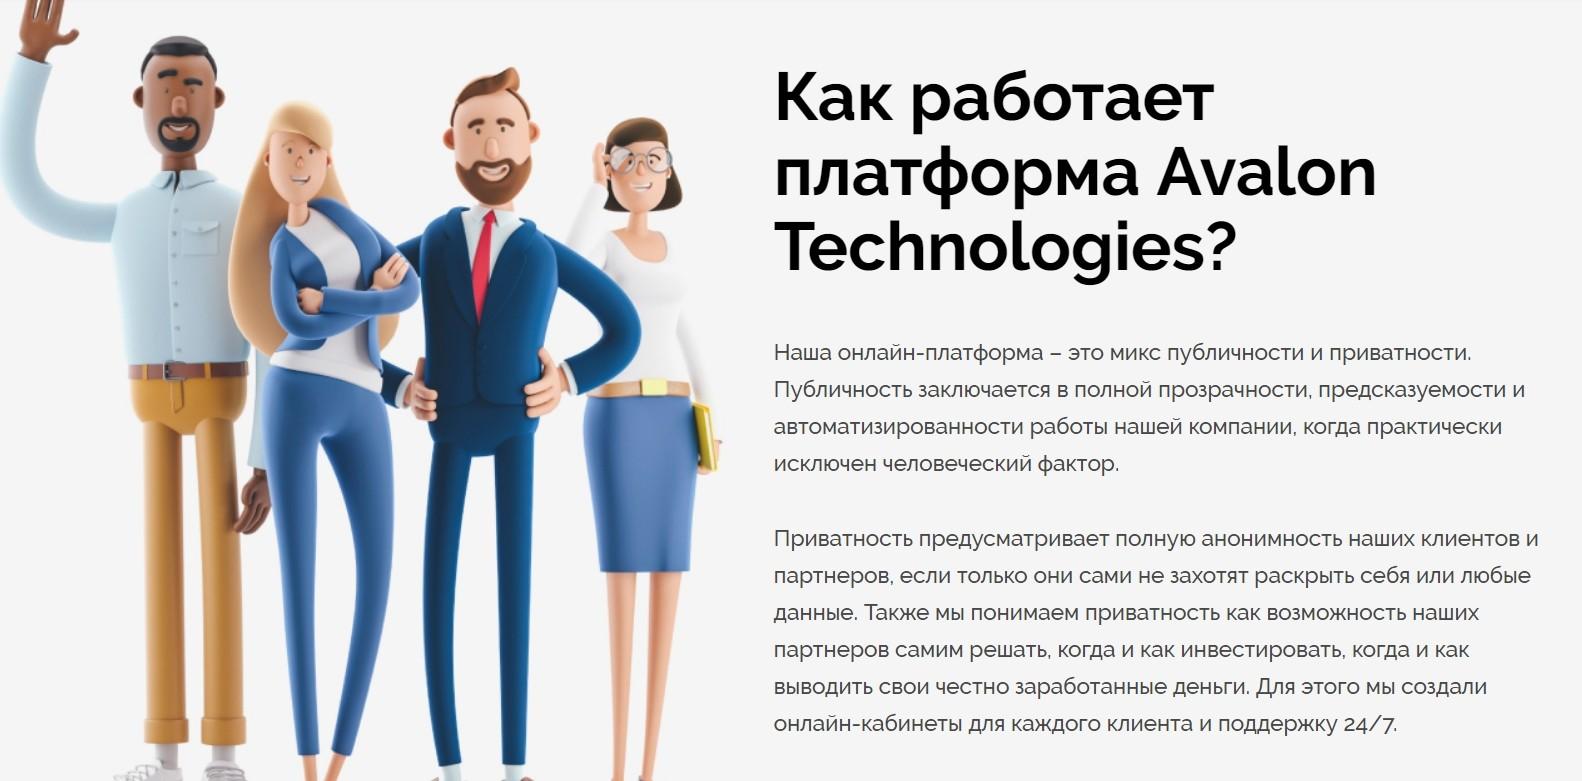 Как работает платформа Avalon Technologies